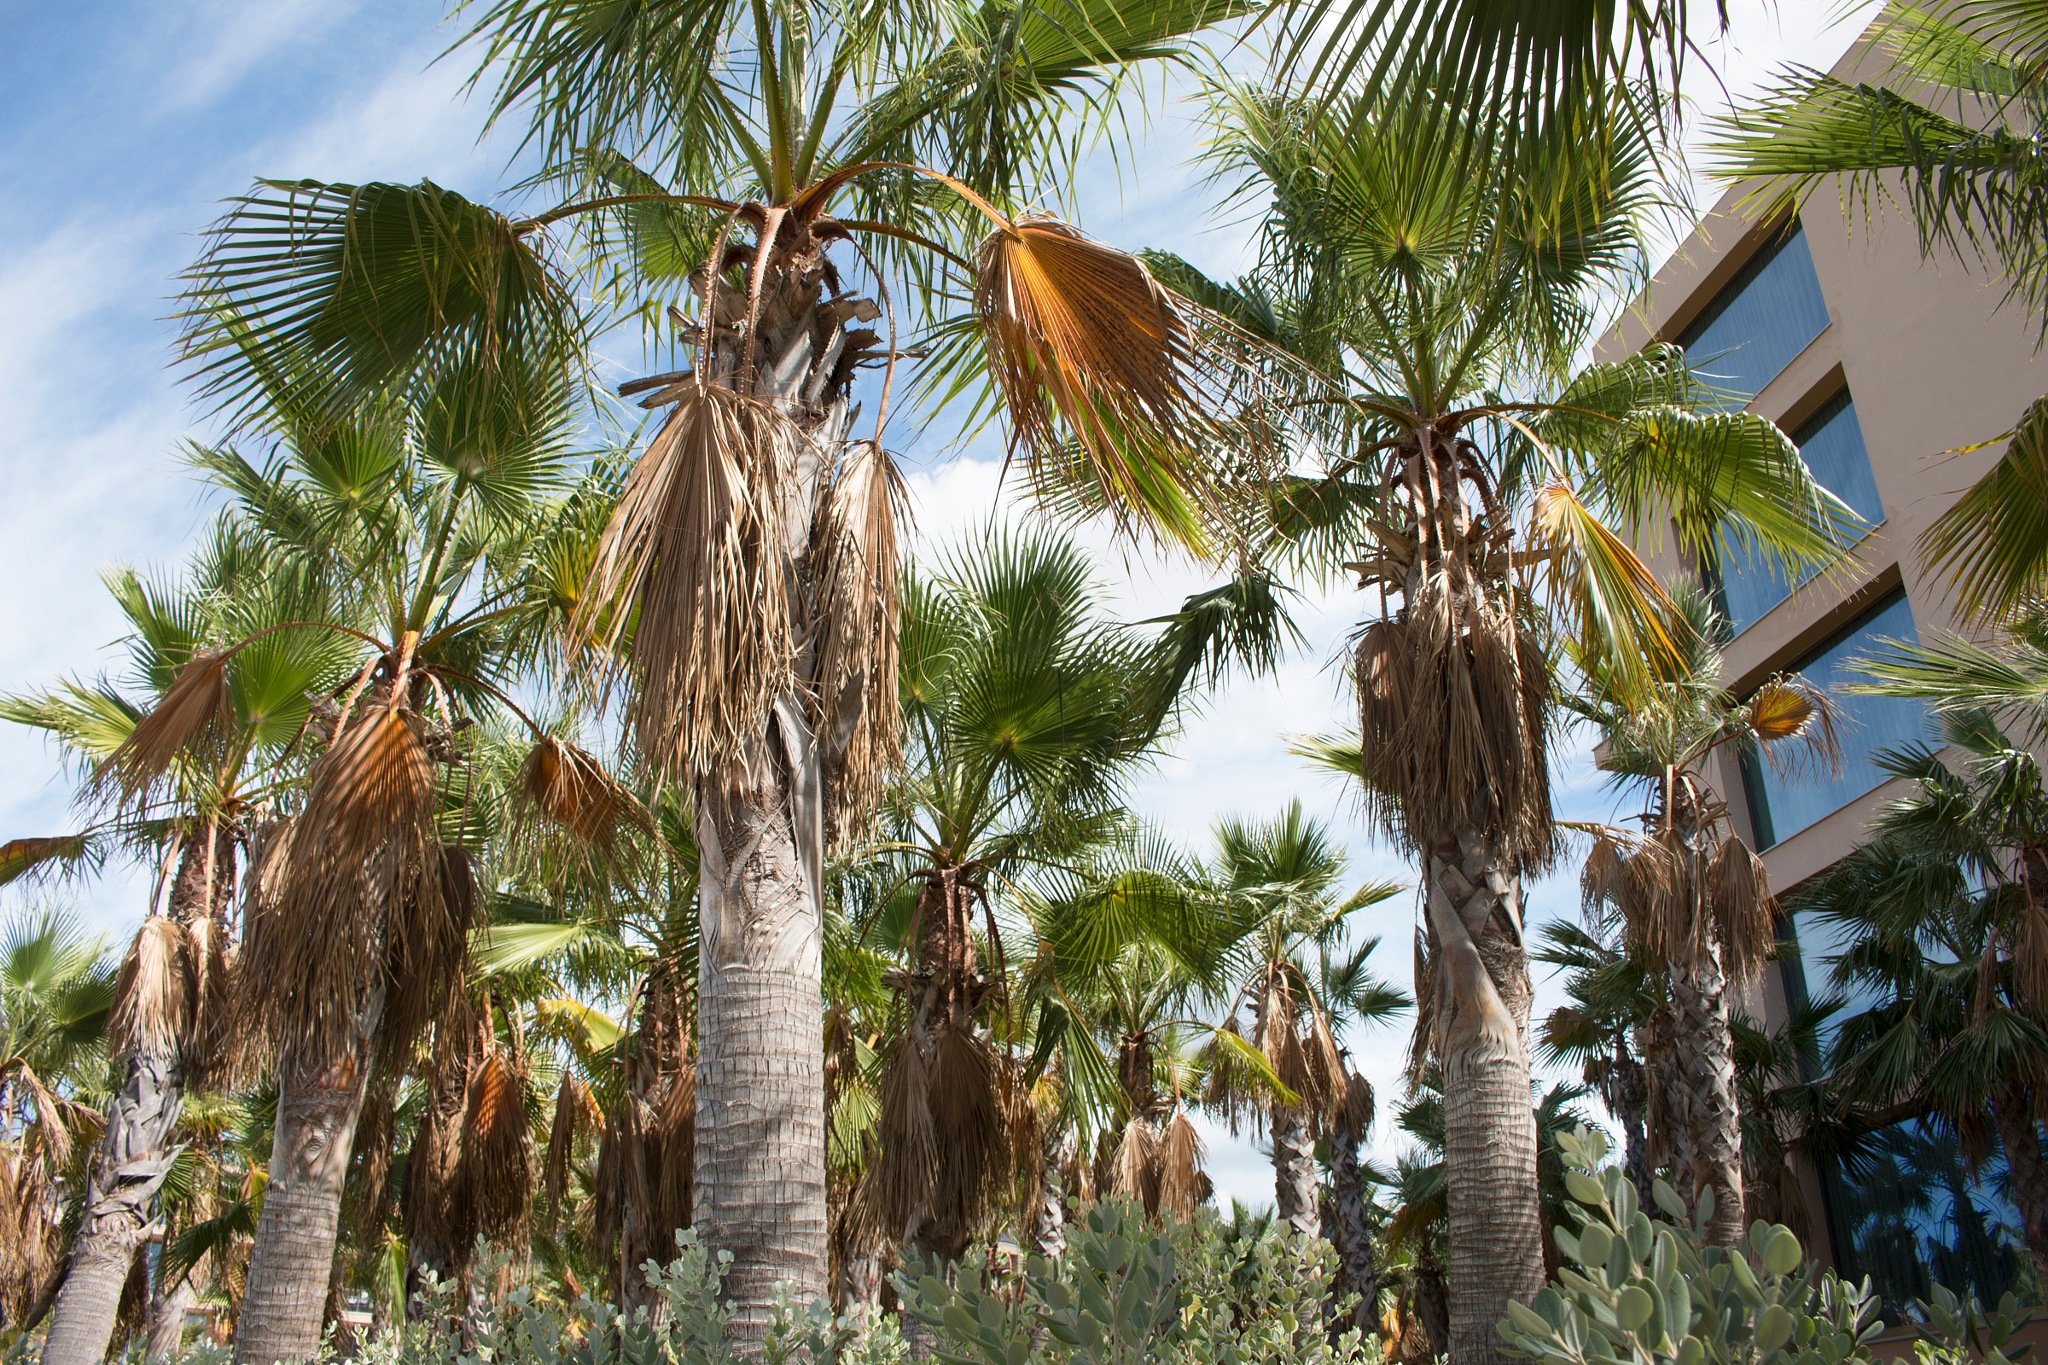 Palm trees by Alexandra Pedro